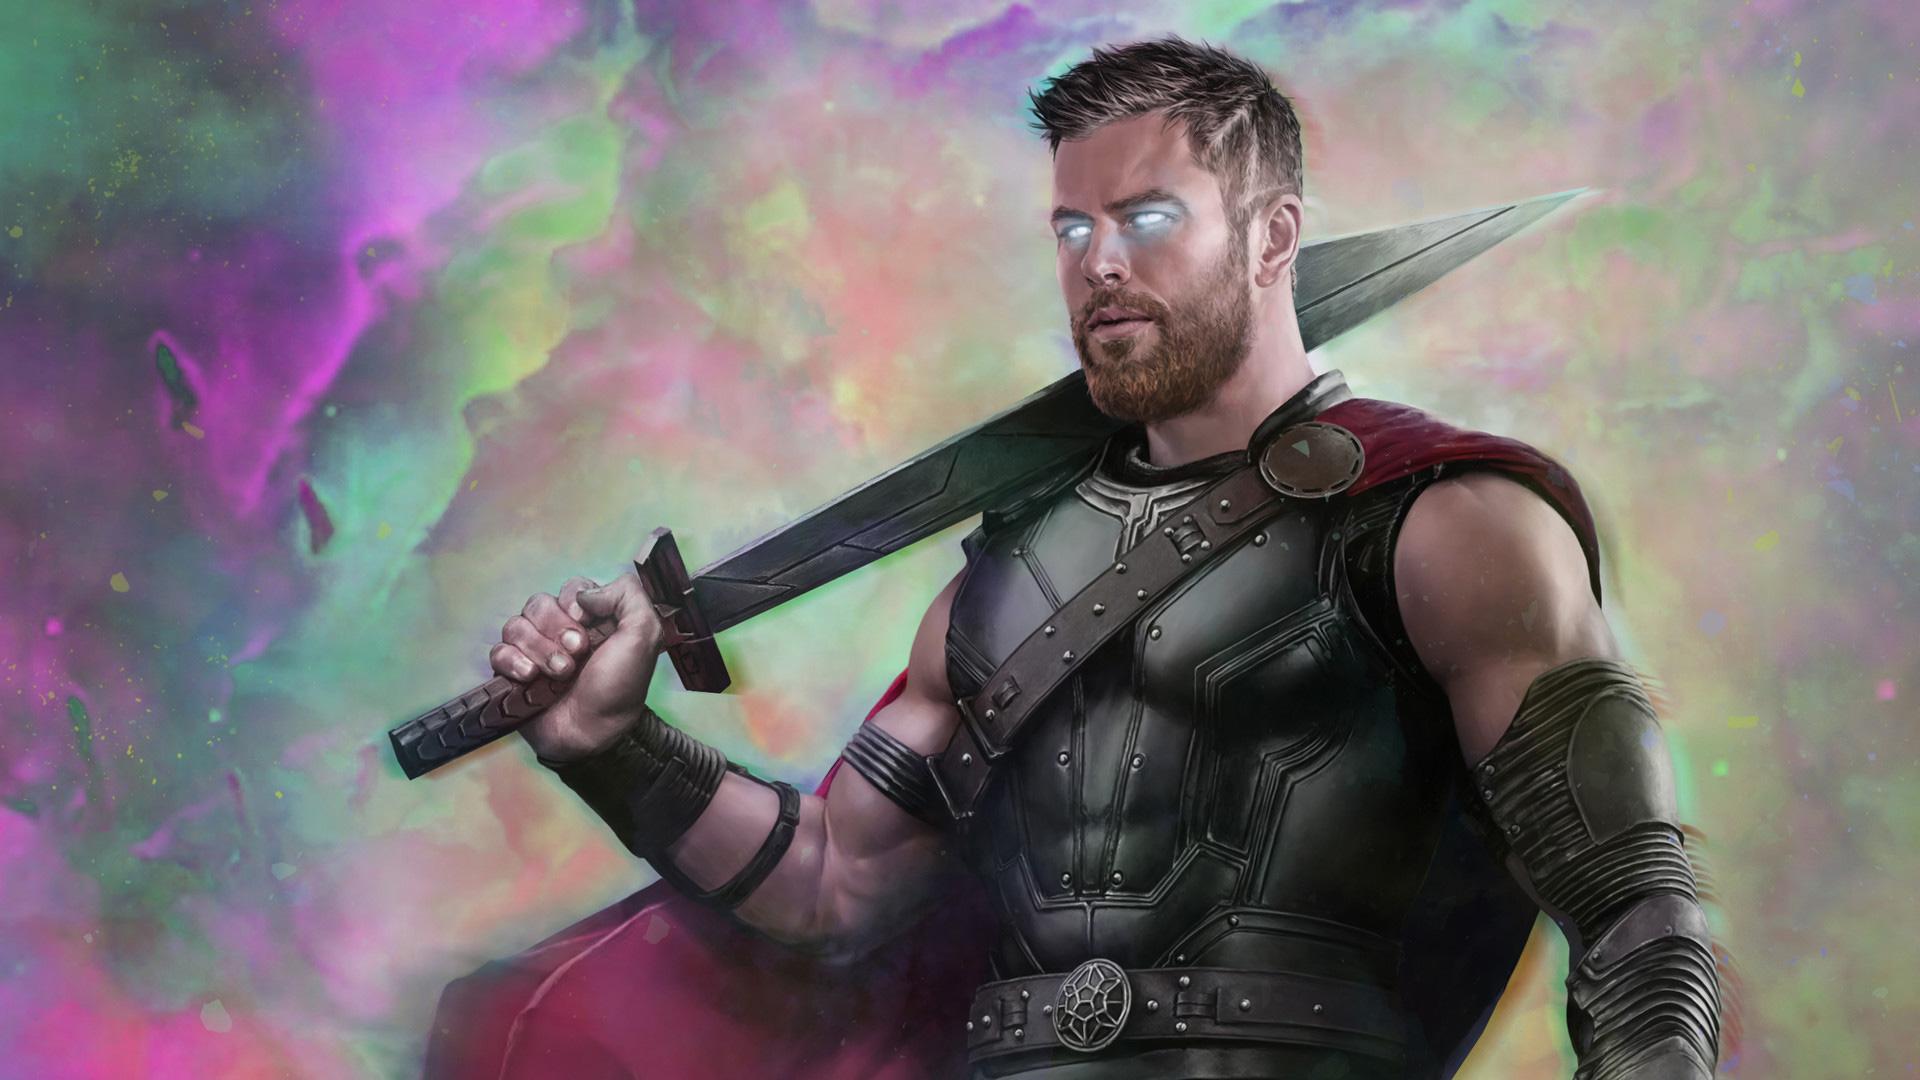 Thor Ragnarok Movie Art 2018 Hd Superheroes 4k Wallpapers Images